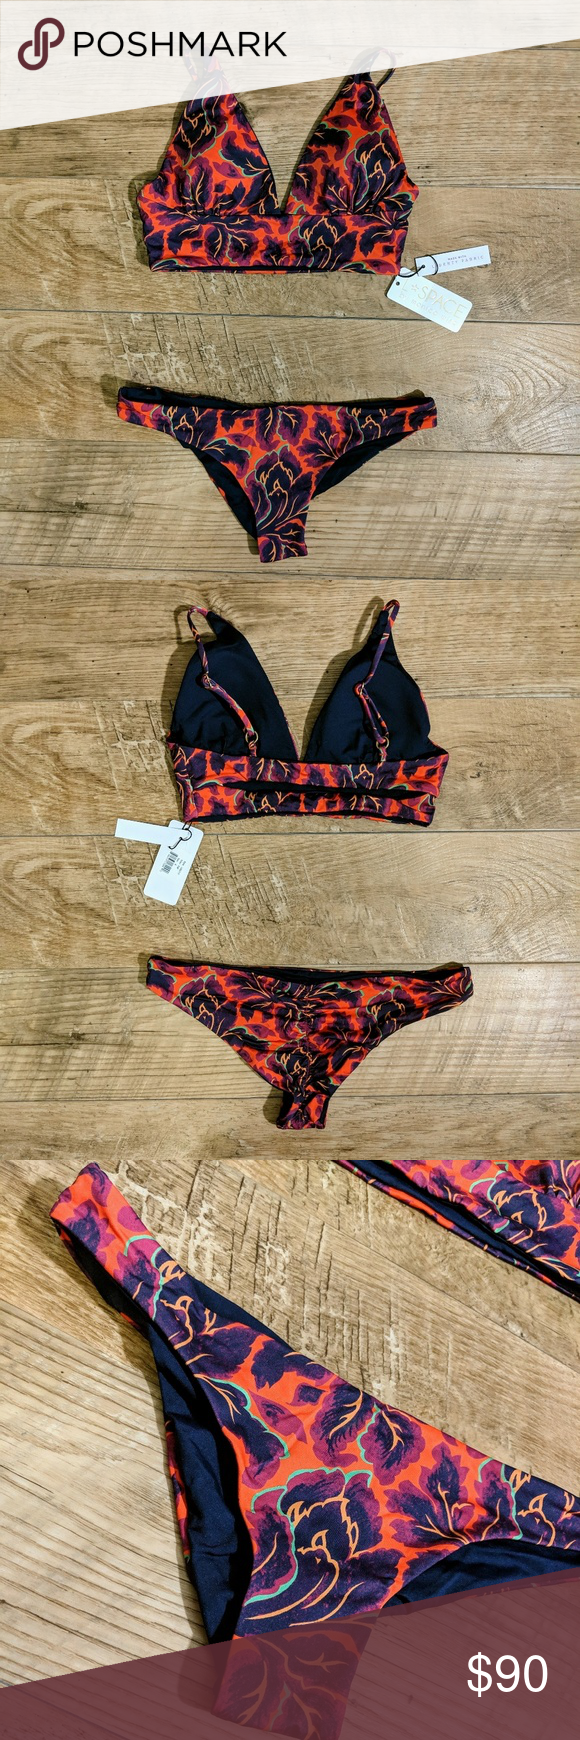 fd743e610758c9 ✨L Space Liberty Fleur Reversible Bikini NWT✨ 💮Features • The top ...